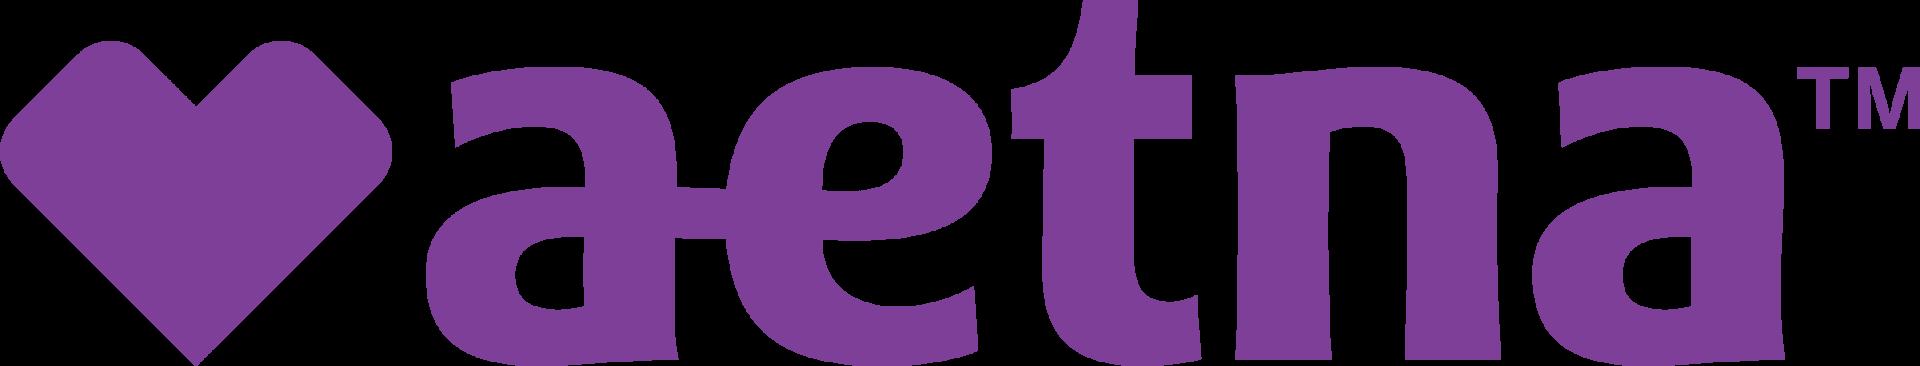 1 Heart Aetna logo sm rgb violet